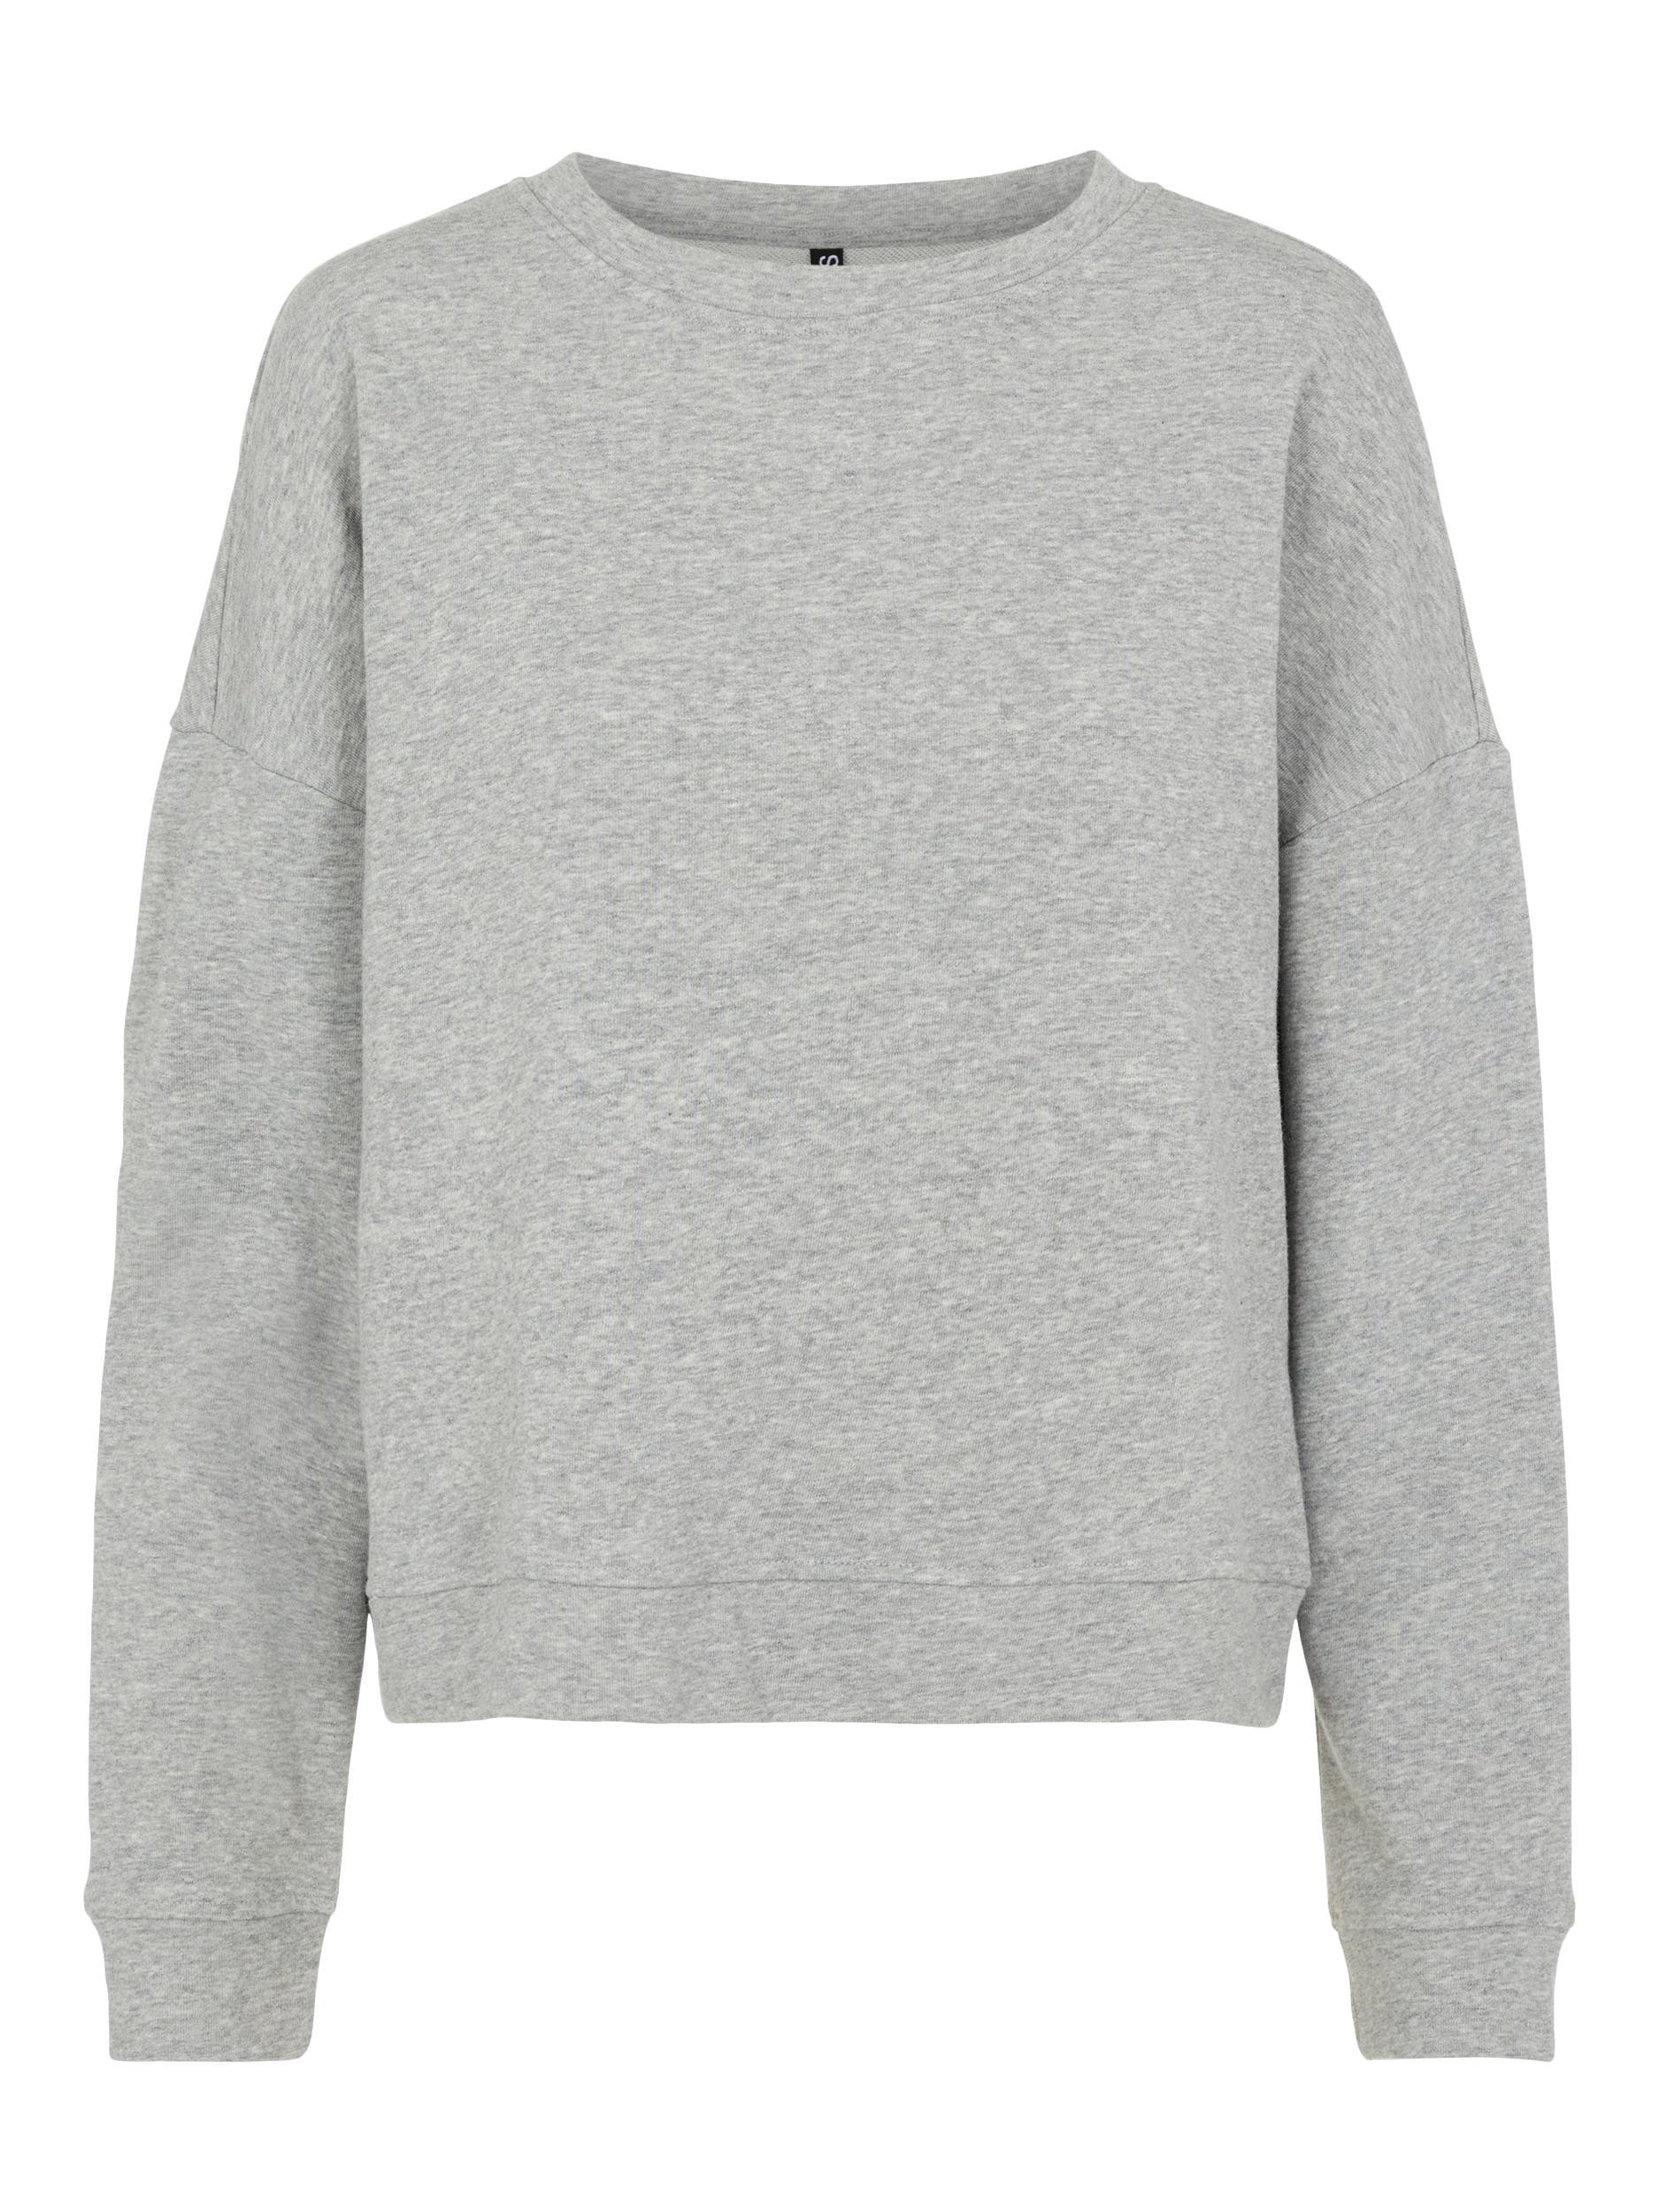 Pieces Chilli Summer sweatshirt, light grey melange, large